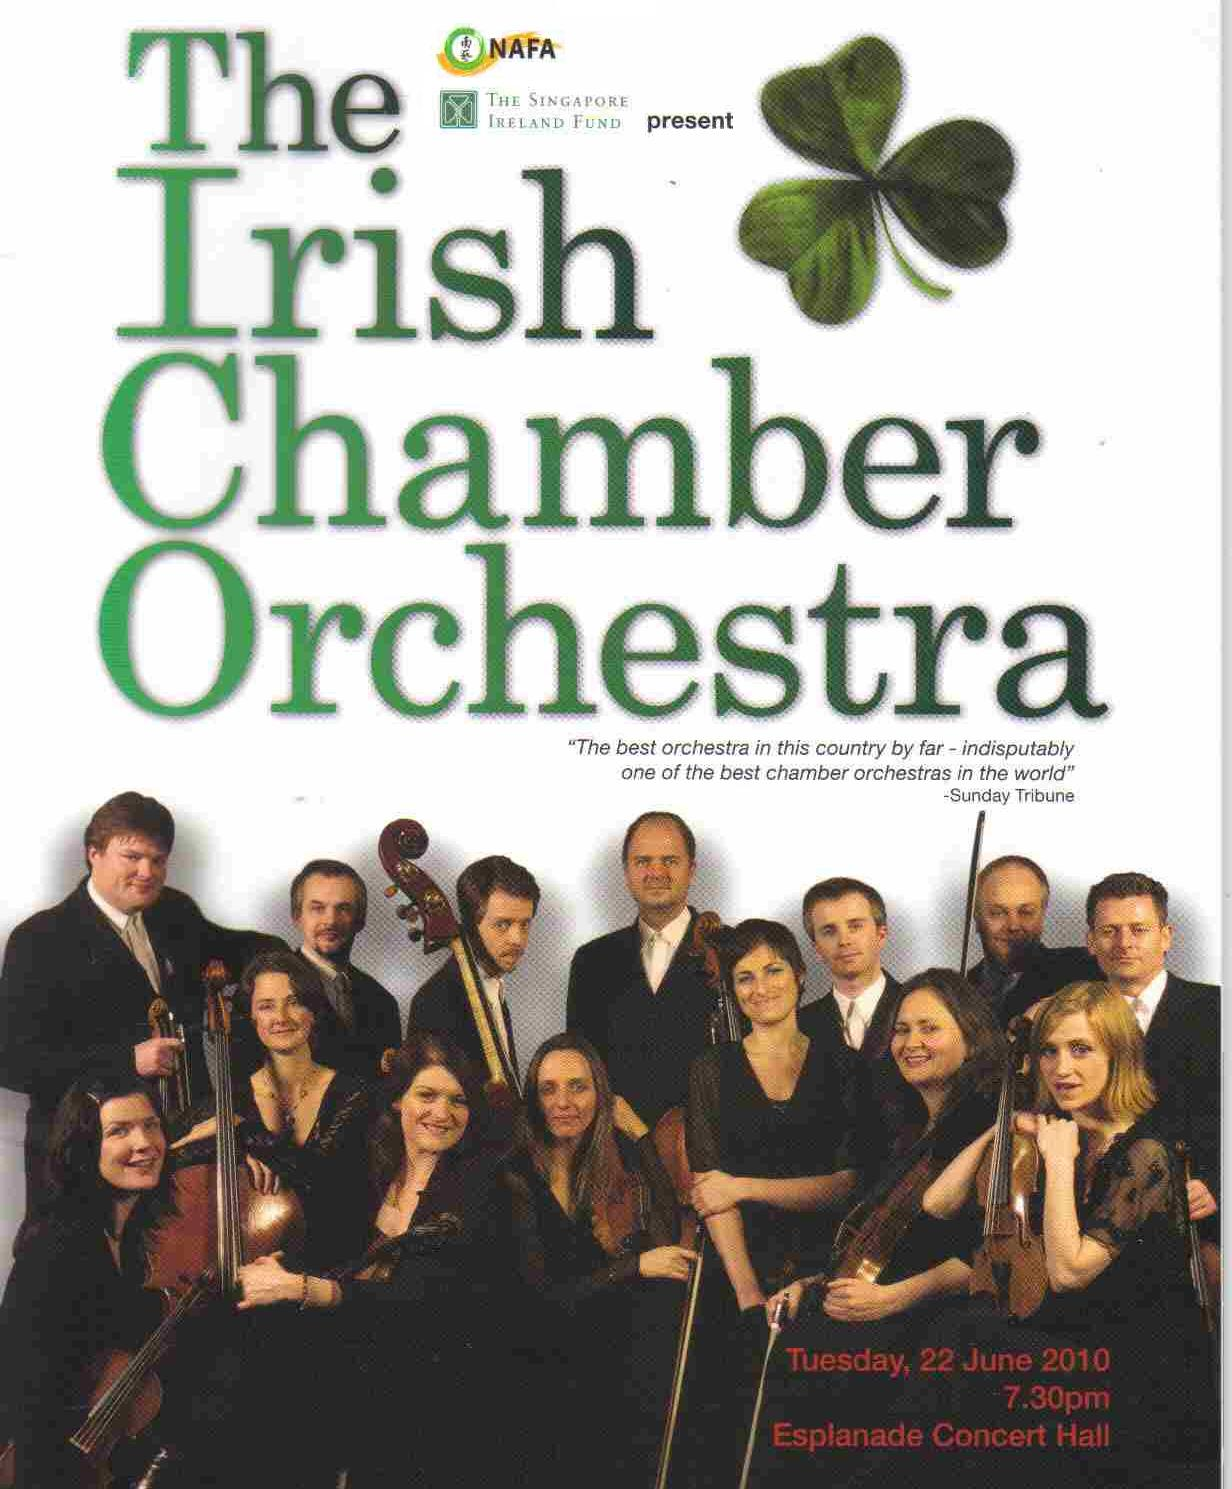 pianomania: IRISH CHAMBER ORCHESTRA / Review